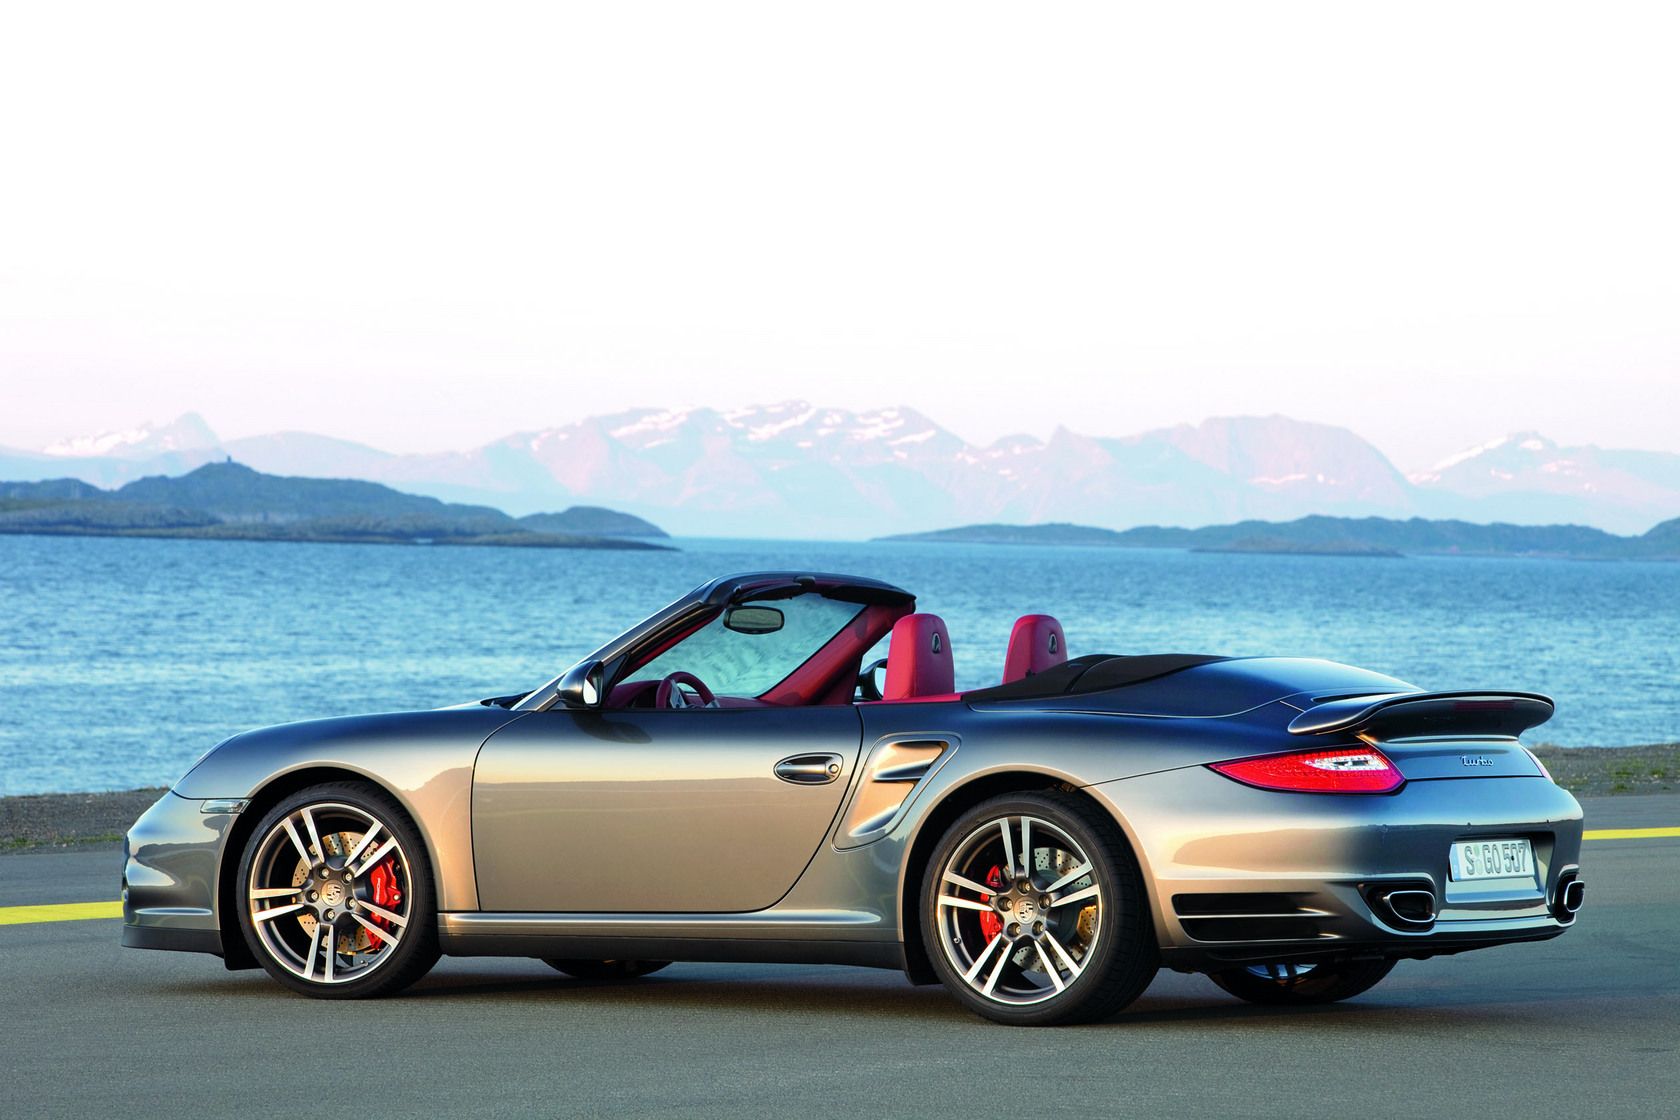 porsche 911 turbo cabrio 2009 auto wallpapers. Black Bedroom Furniture Sets. Home Design Ideas